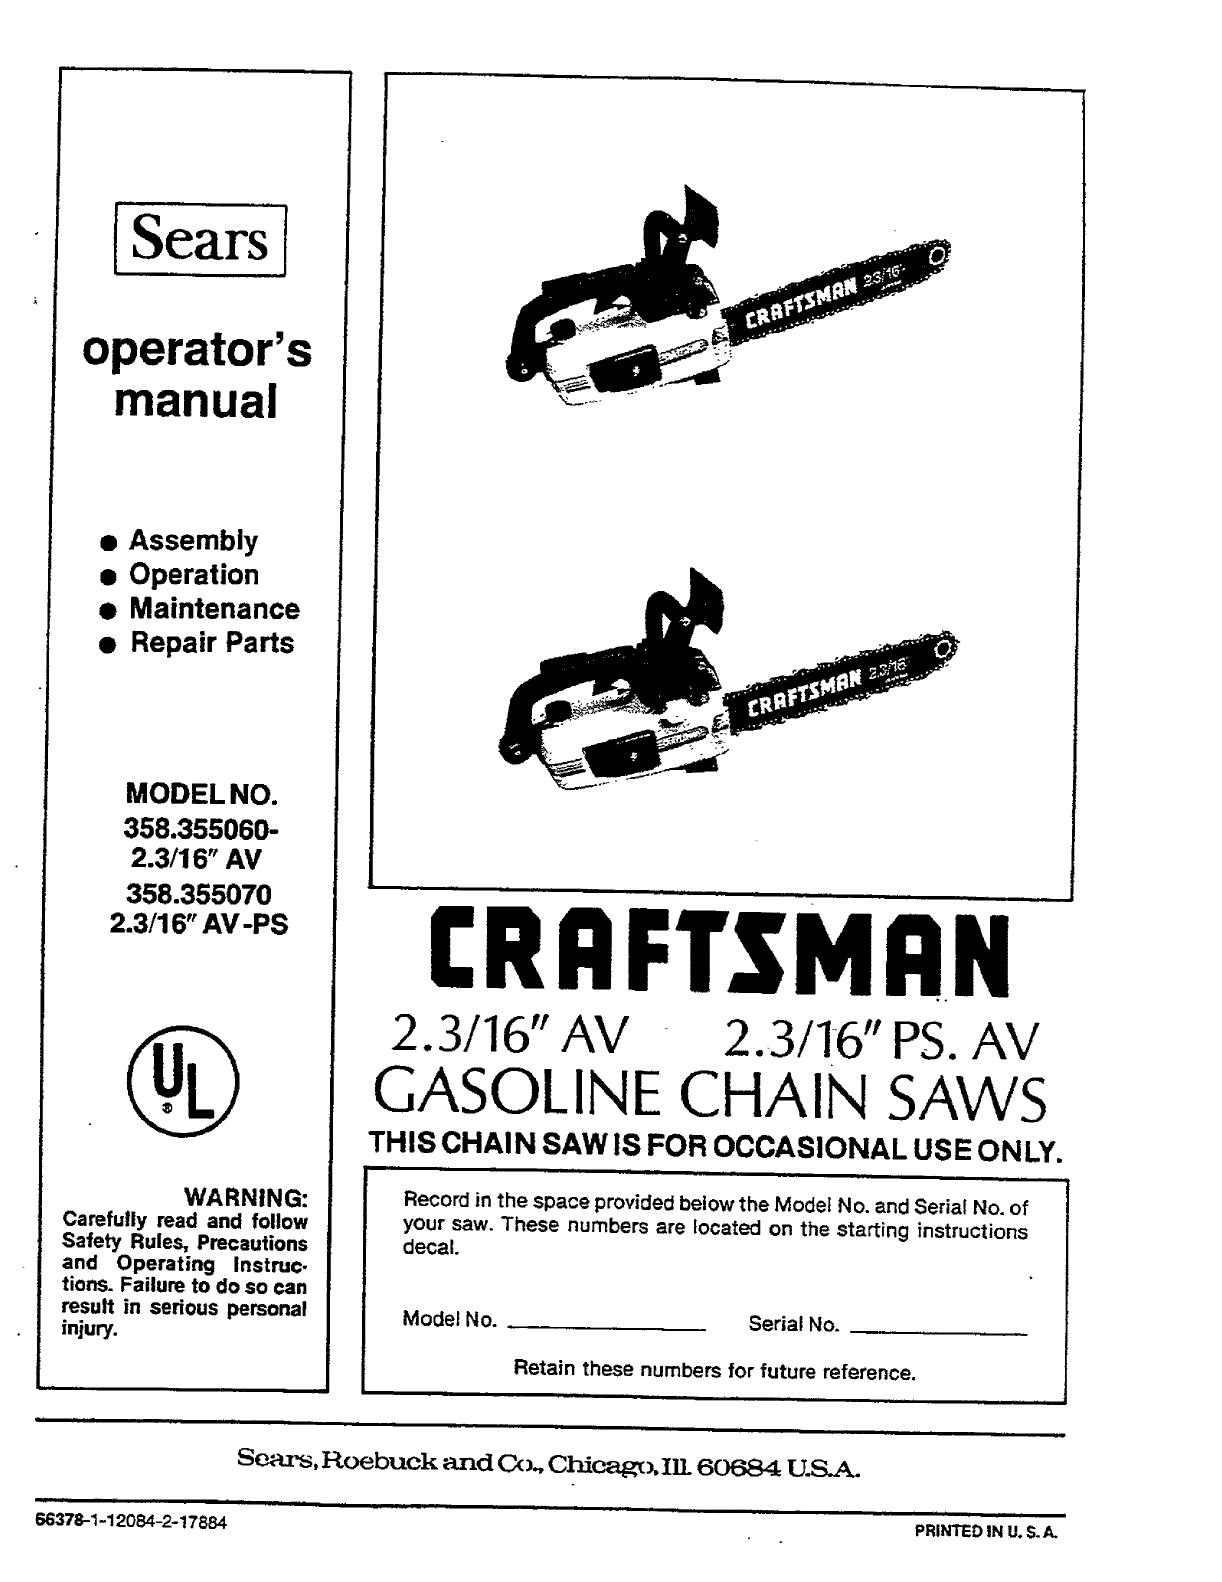 Craftsman 358355060 User Manual GASOLINE CHAIN SAWS Manuals